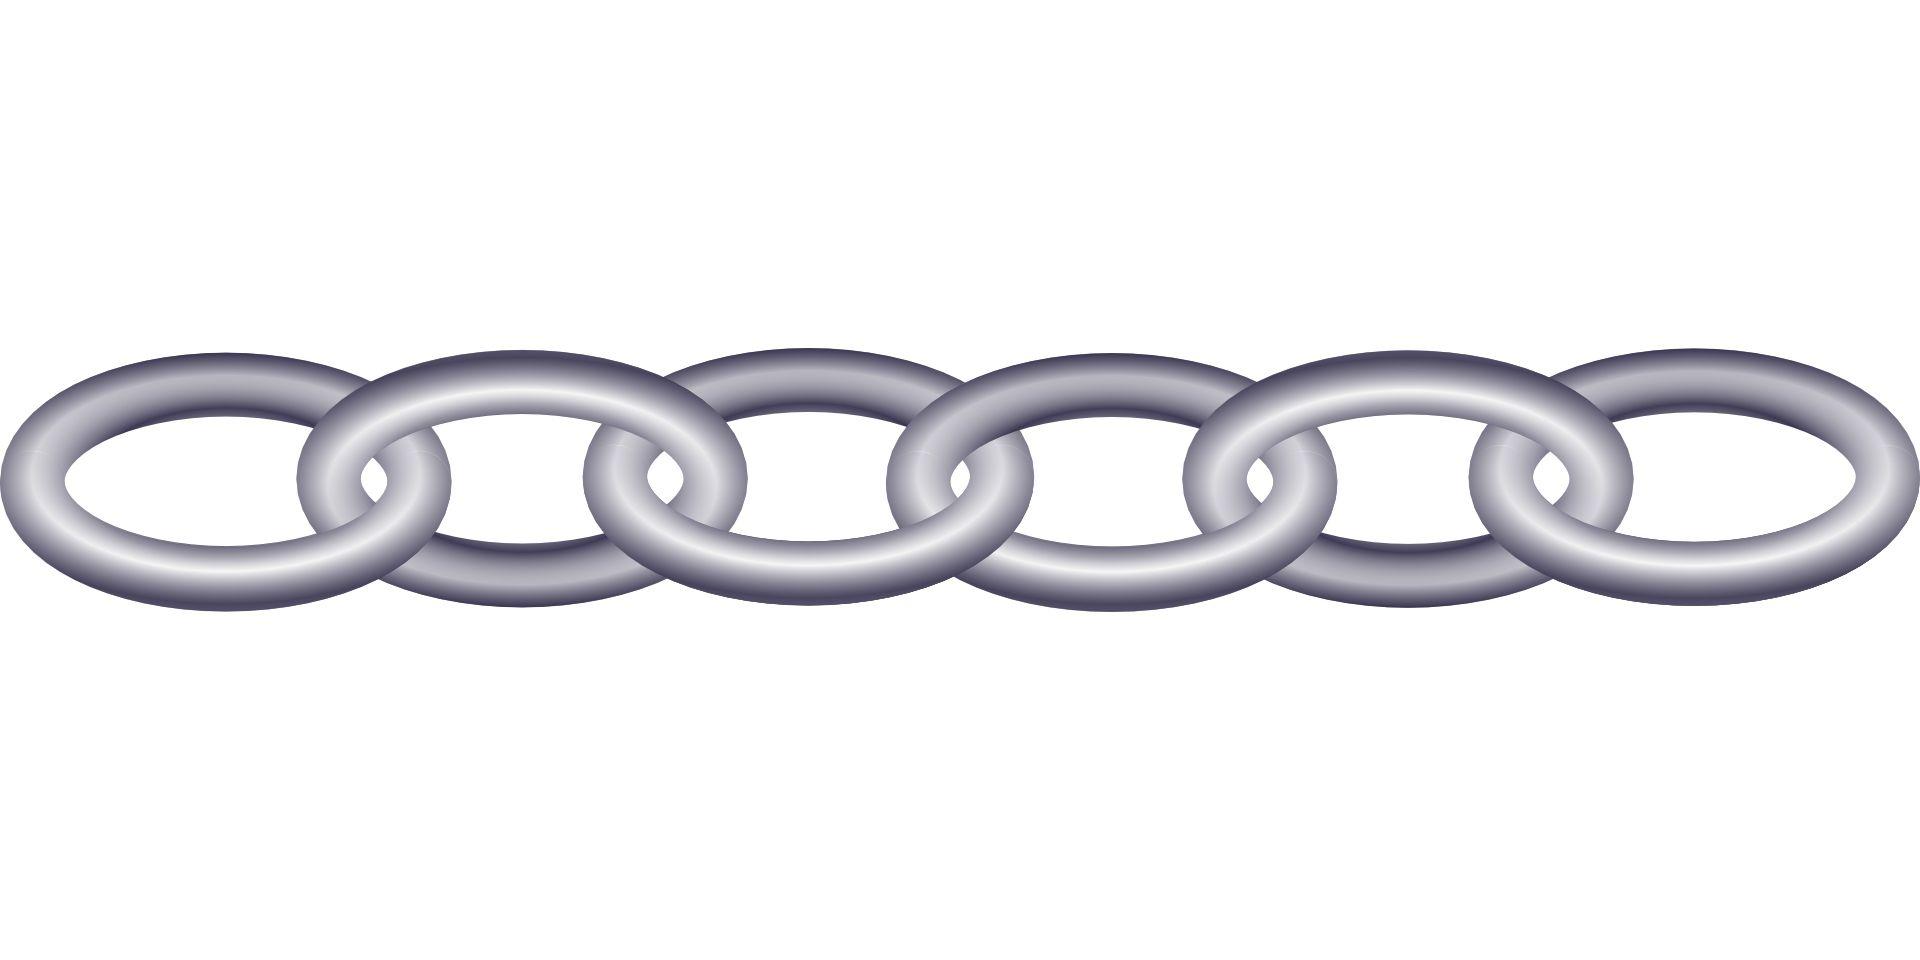 Circle chain vector.